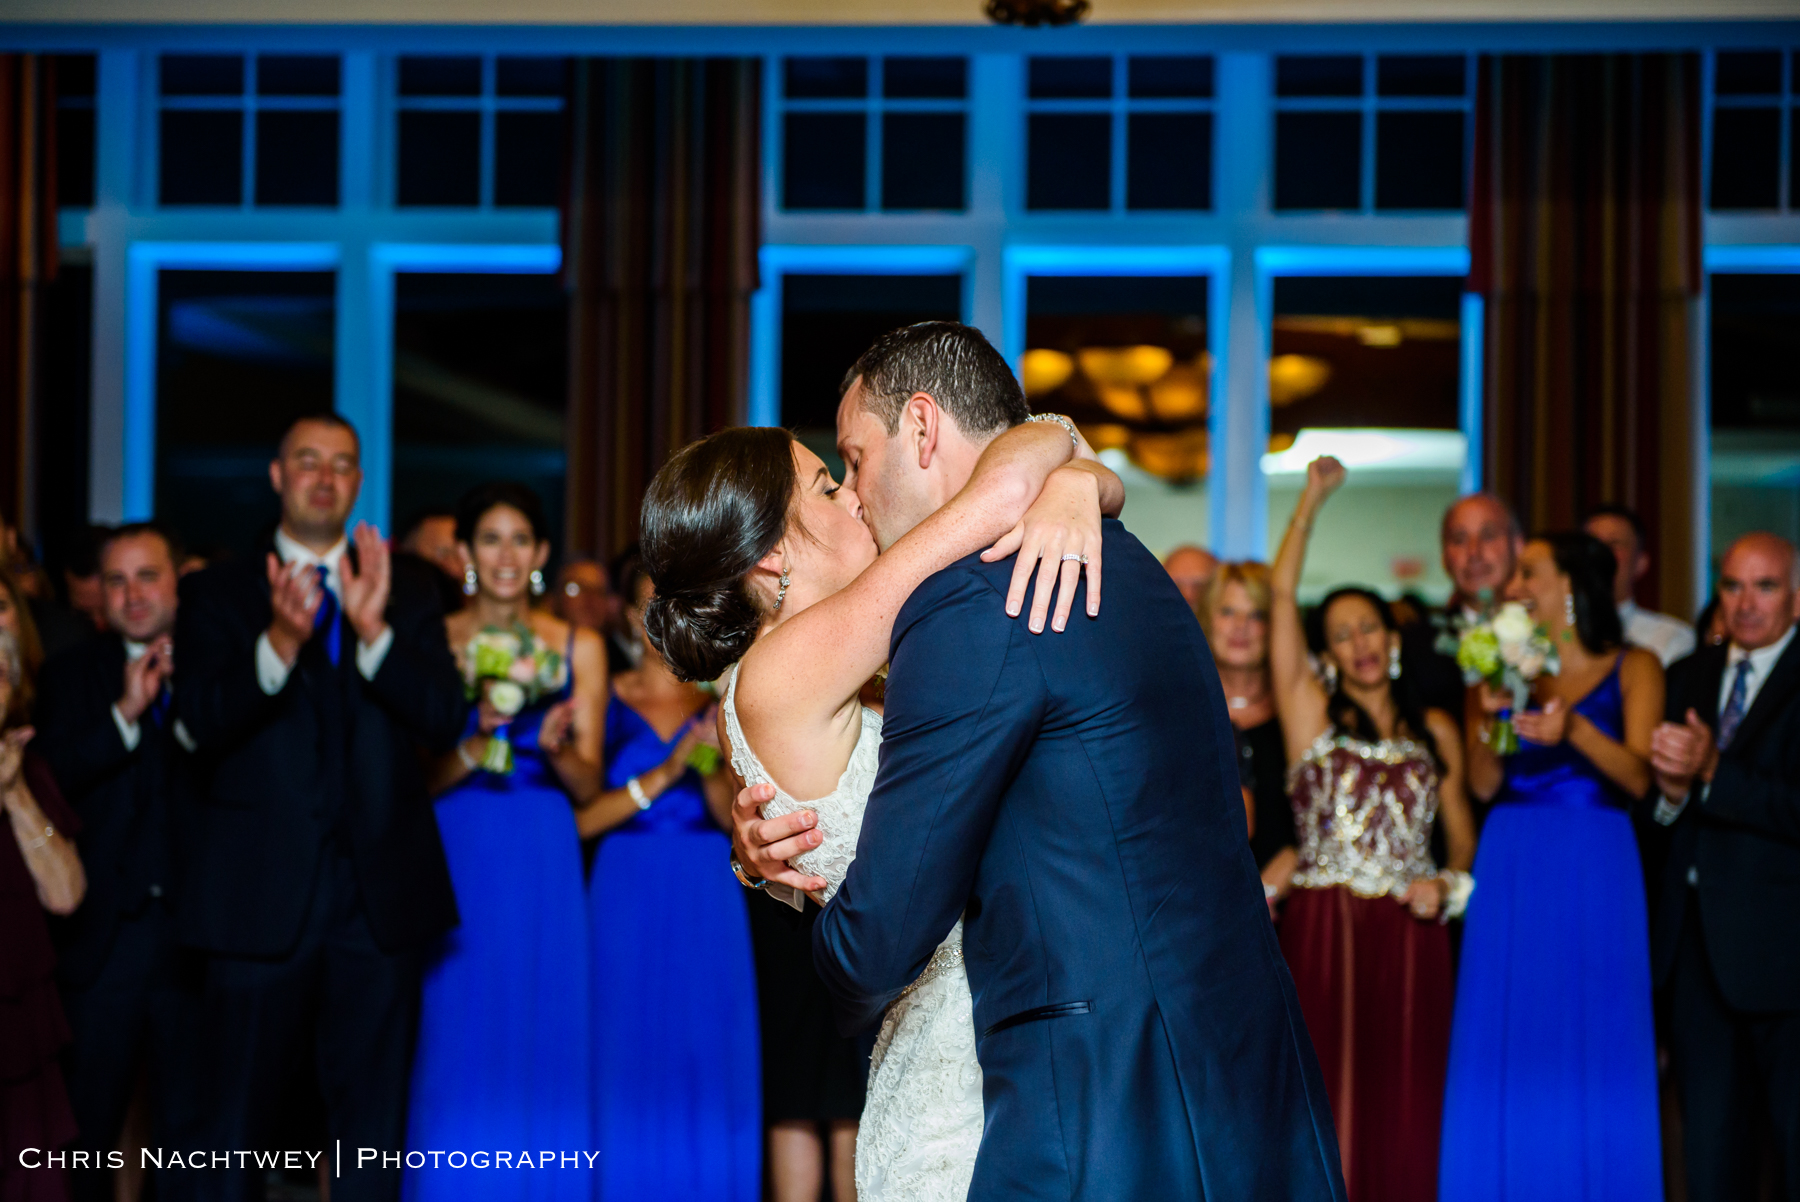 wedding-lake-of-isles-photos-chris-nachtwey-photography-2019-53.jpg